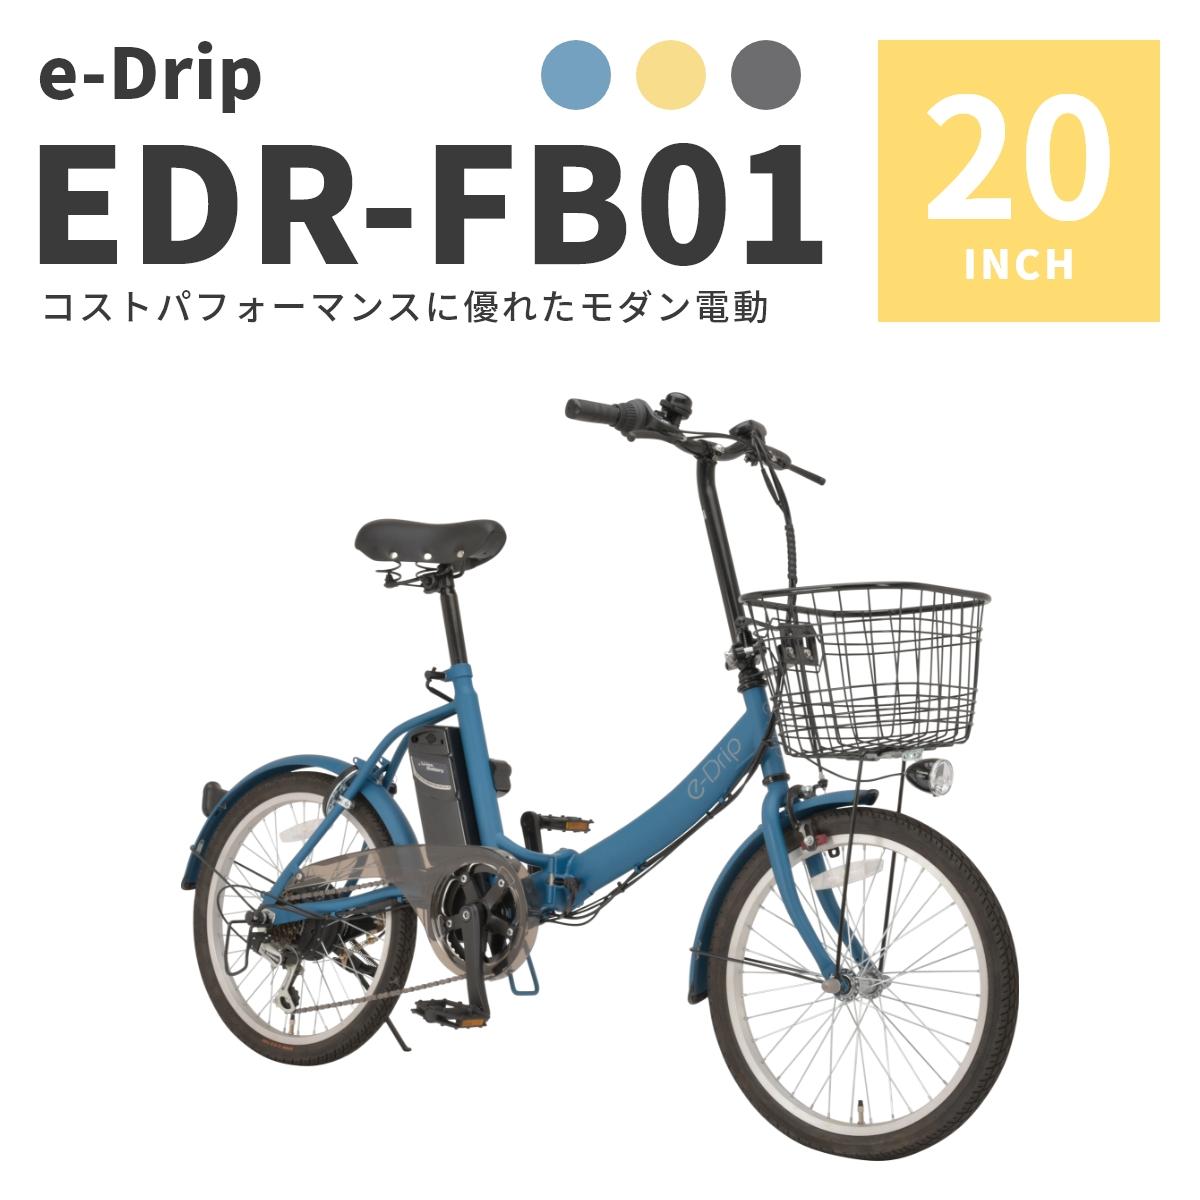 edr-fb01_ec_01